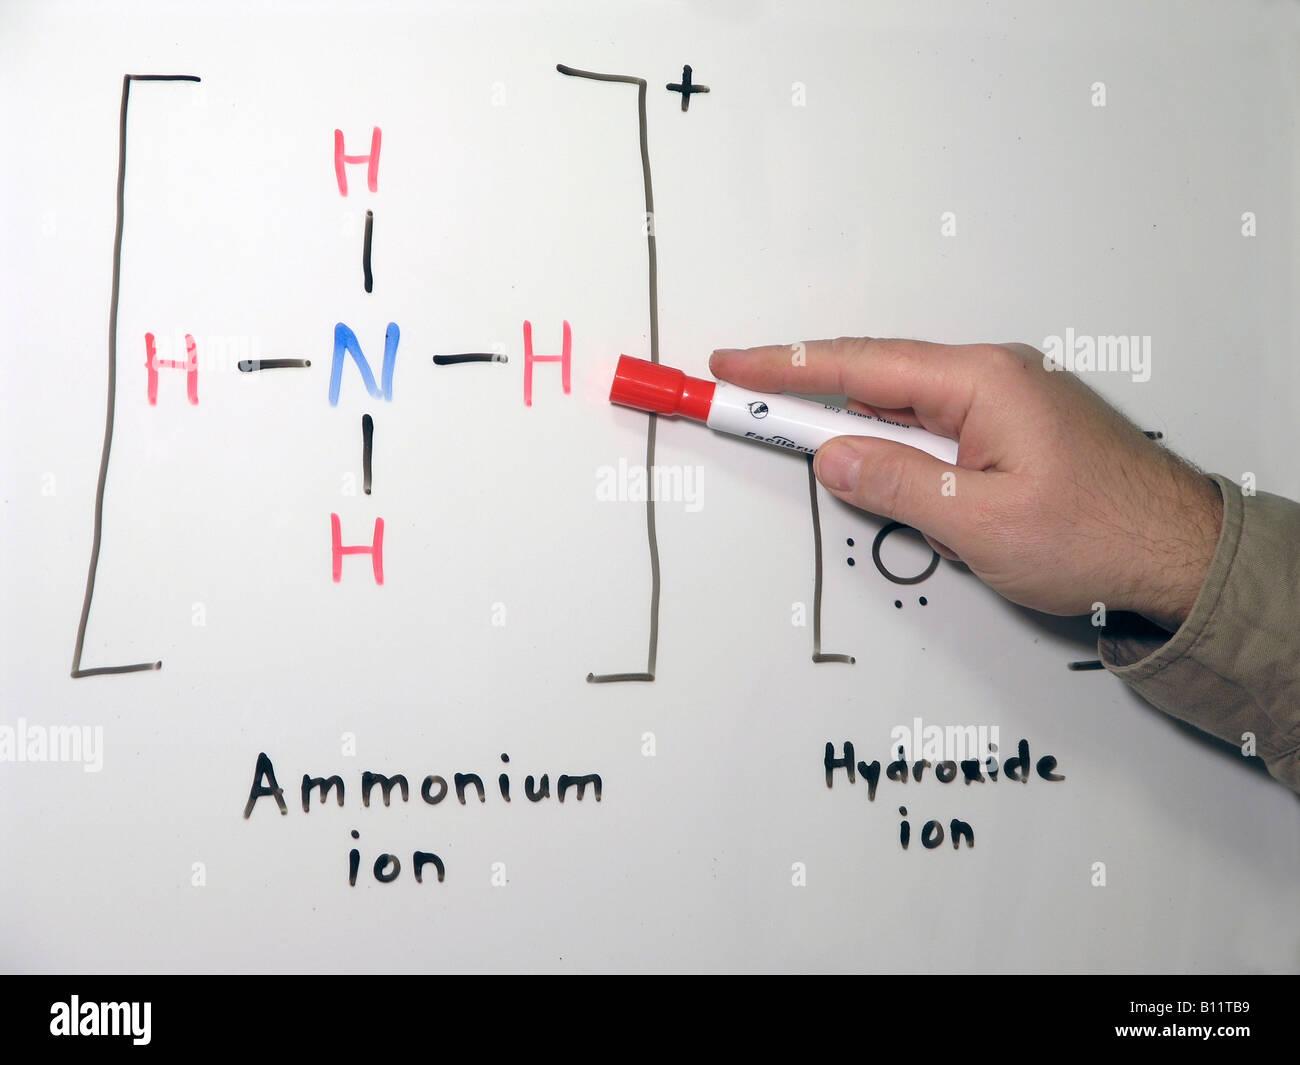 Ammonium Hydroxide Stock Photos Ammonium Hydroxide Stock Images